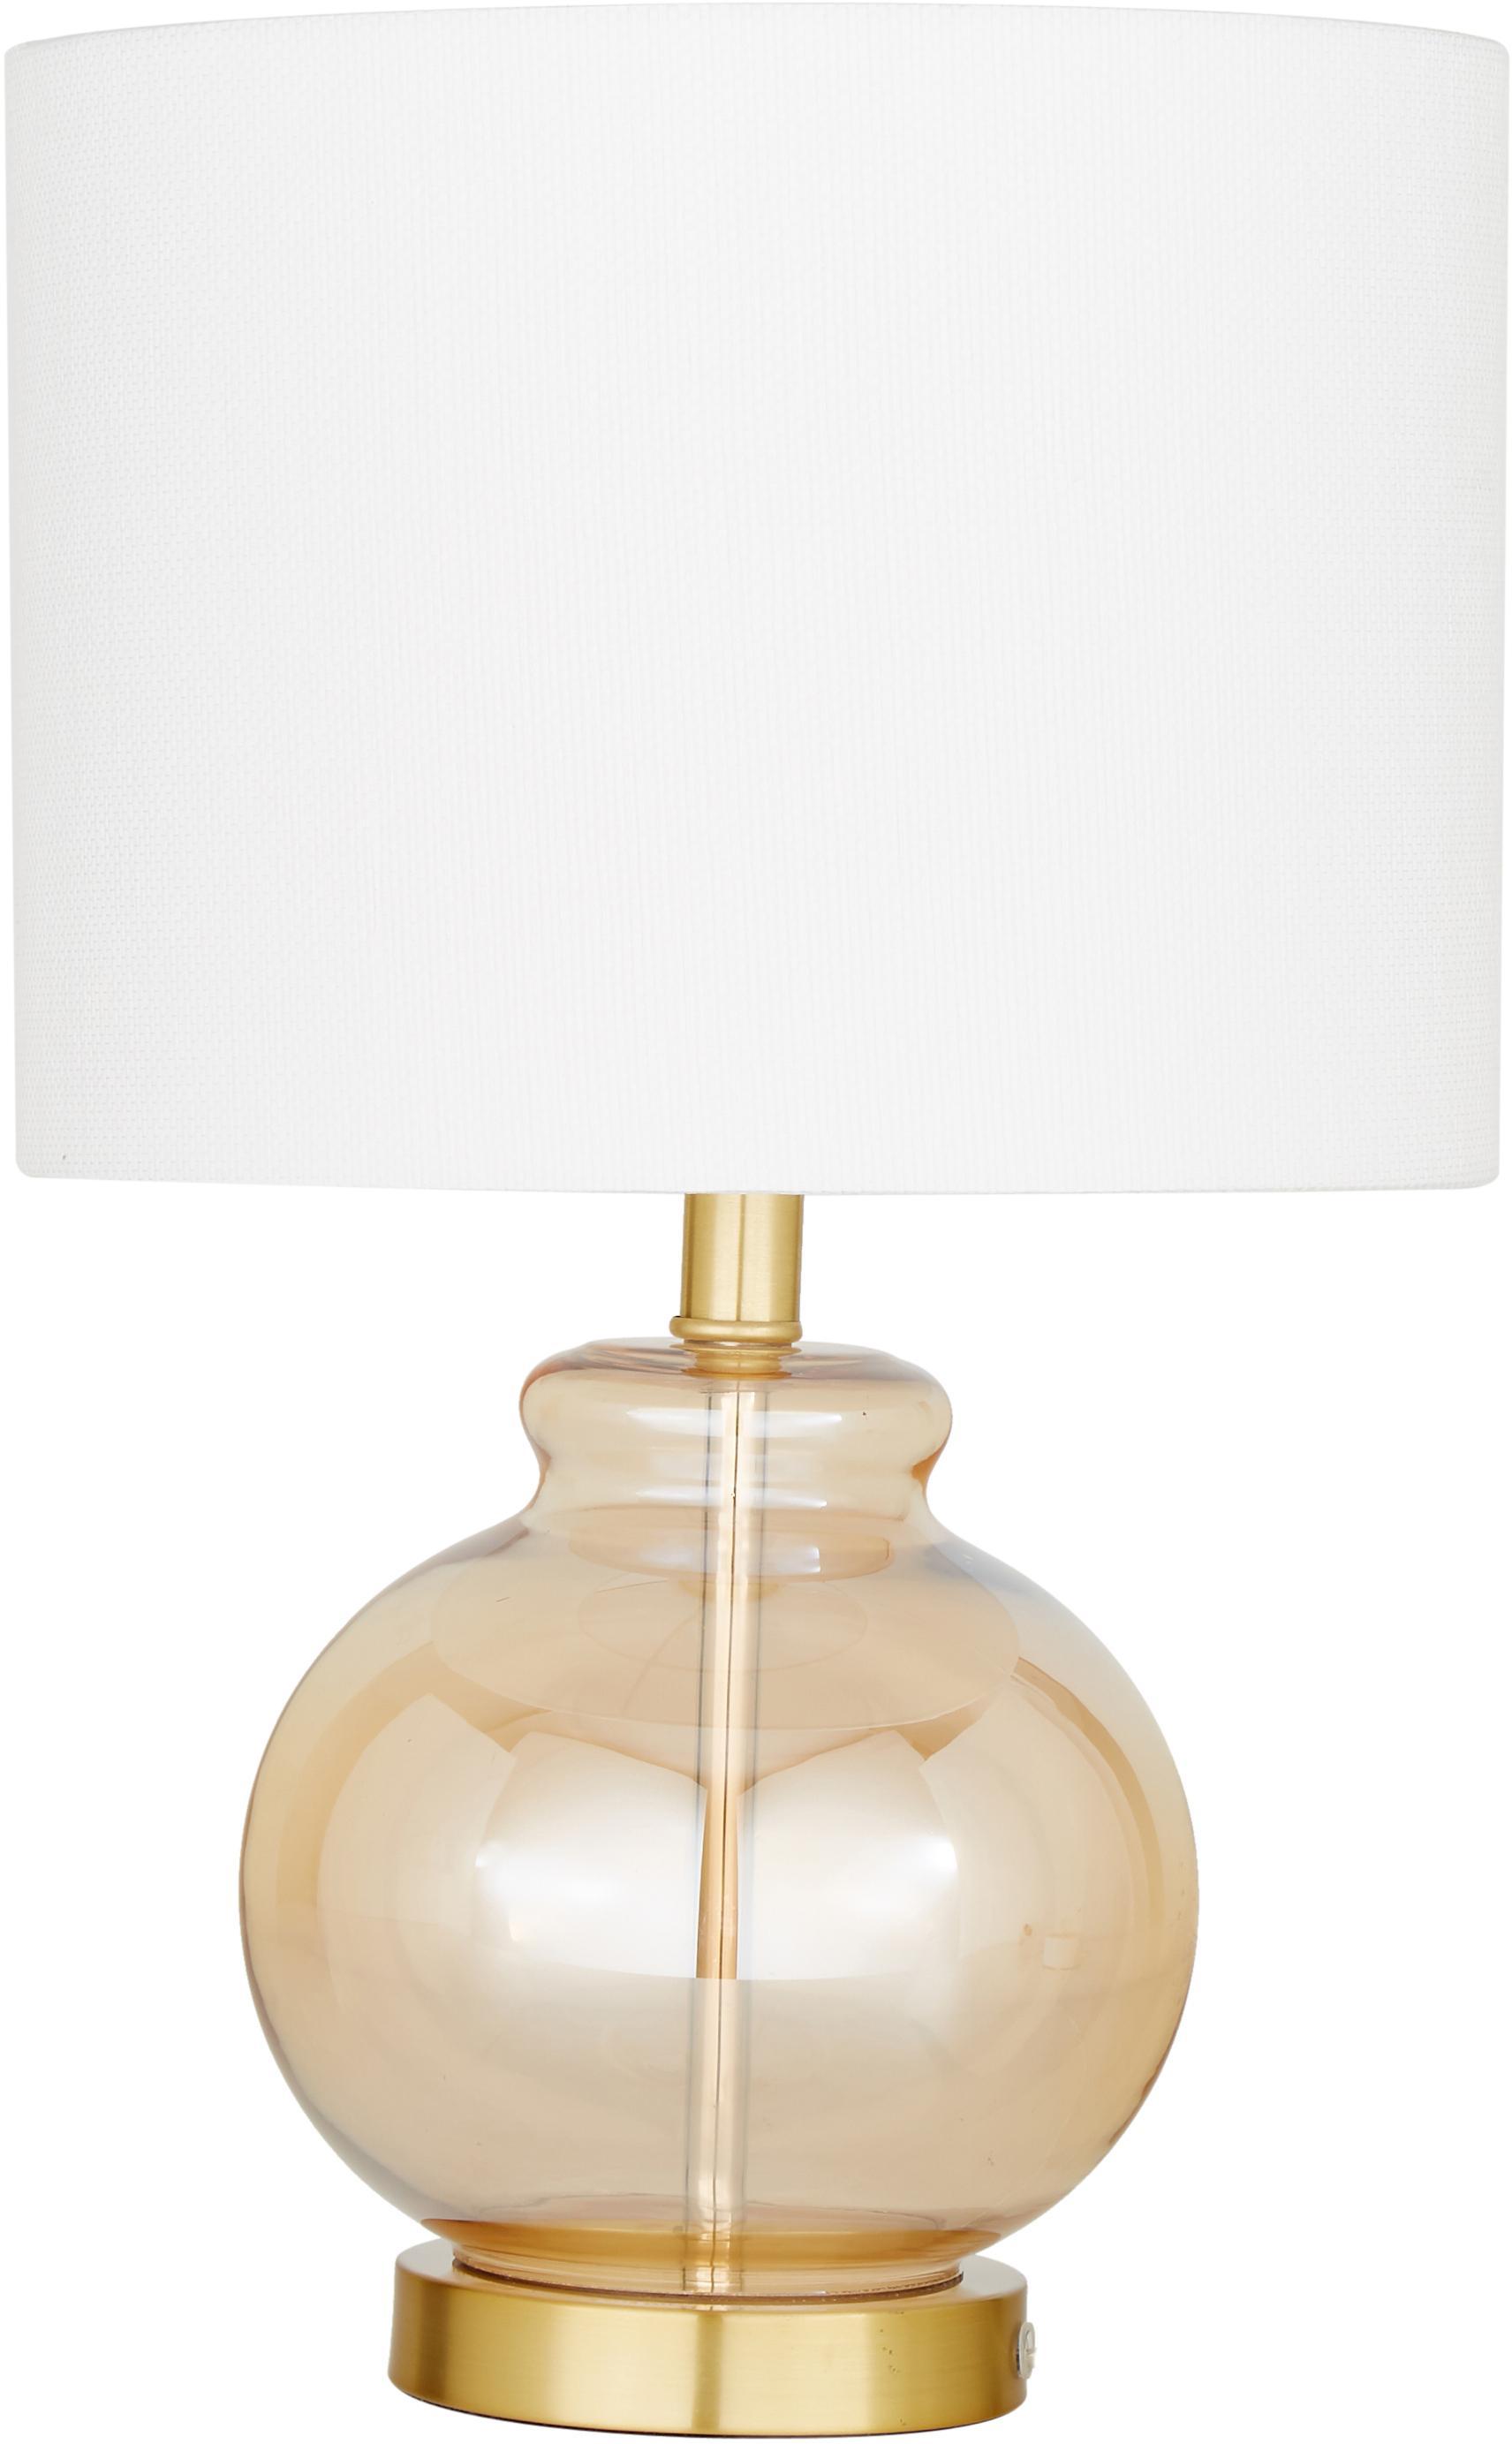 Tafellamp Natty, Lampenkap: textiel, Lampvoet: glas, geborsteld messing, Wit, amberkleurig, transparant, Ø 31 x H 48 cm